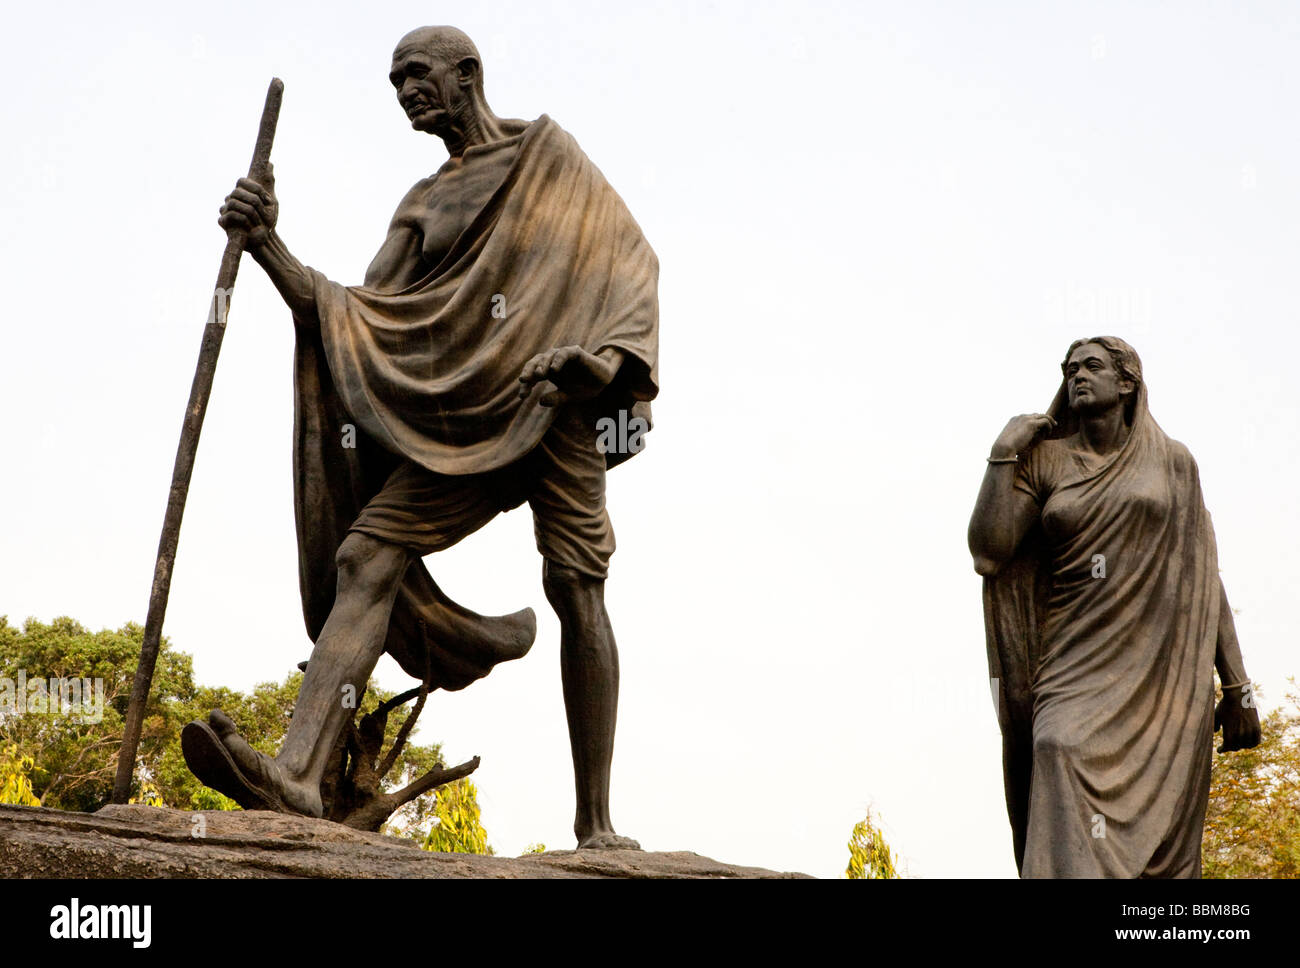 Bronze Statue Of Mahatma Gandhi and his Wife Kasturba New Delhi India - Stock Image